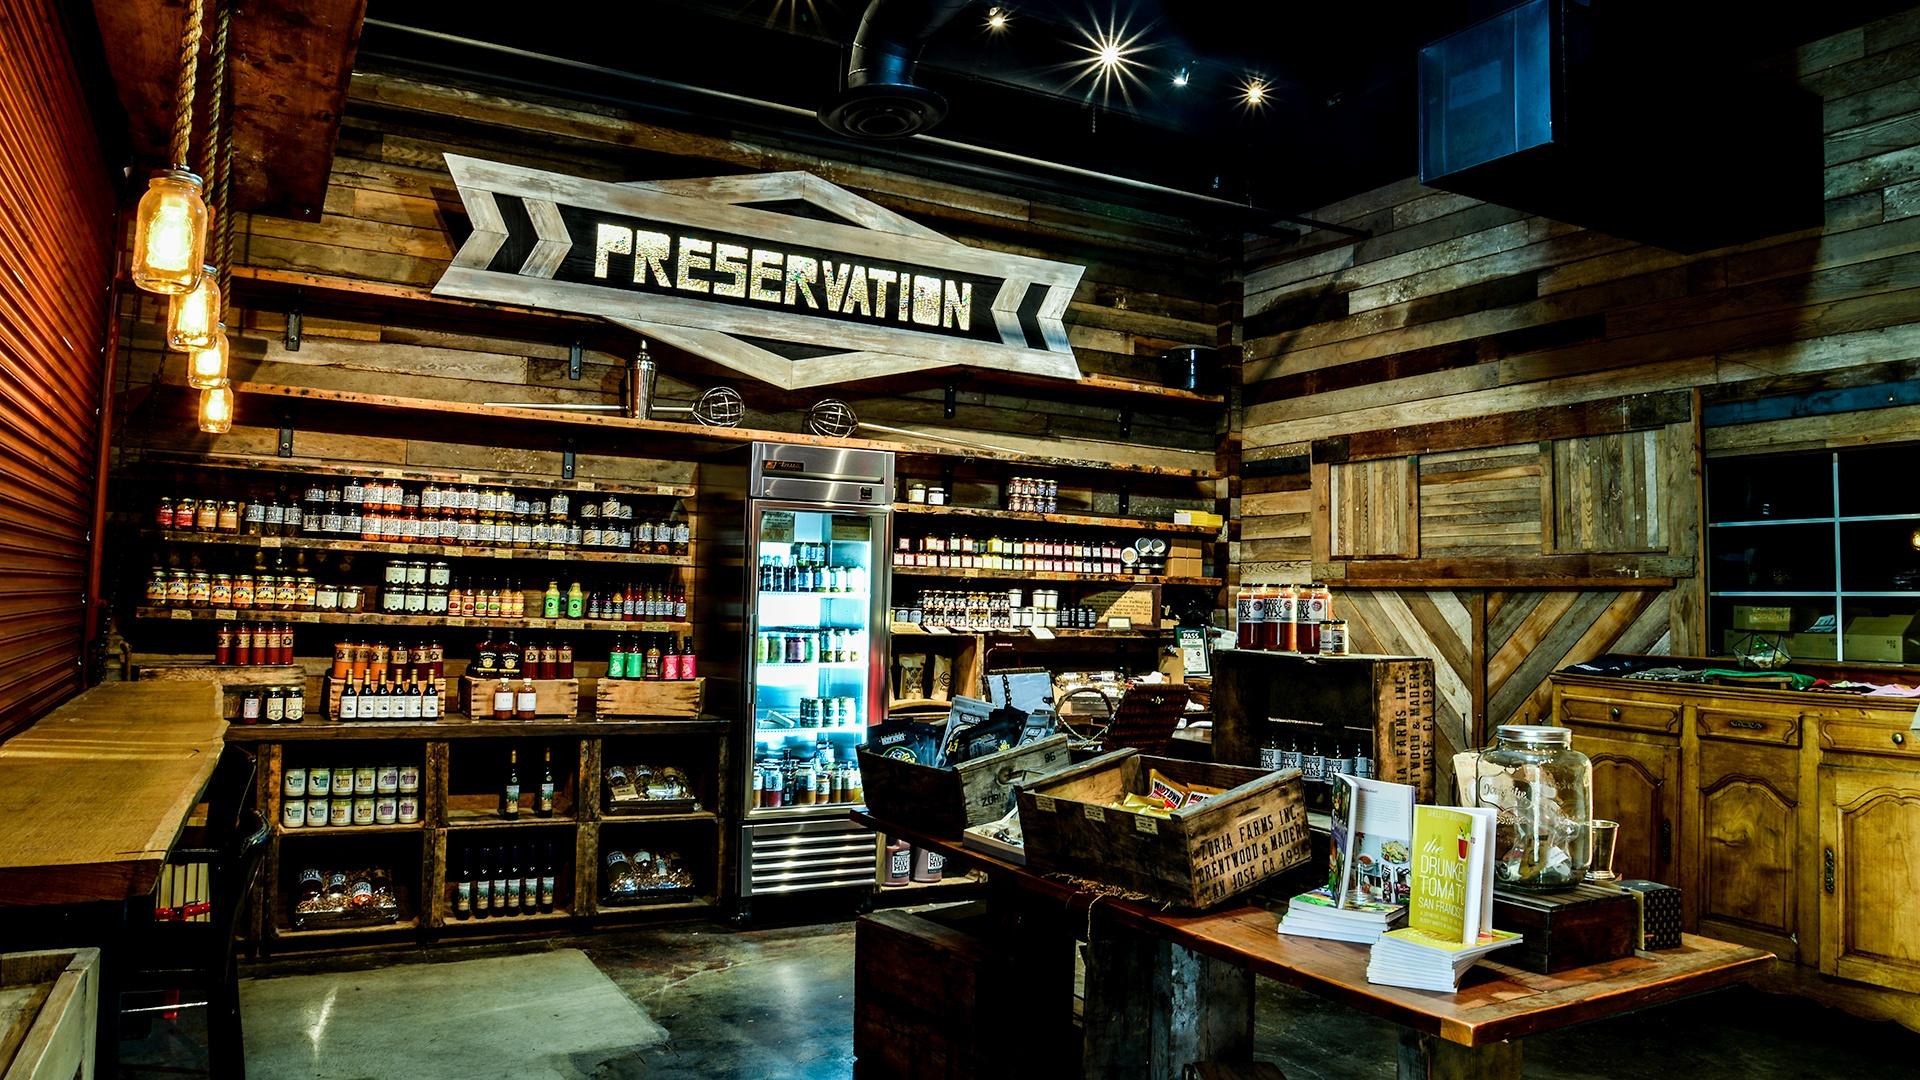 Business member spotlight: Q&A withPreservation & co. owner Jason Poole